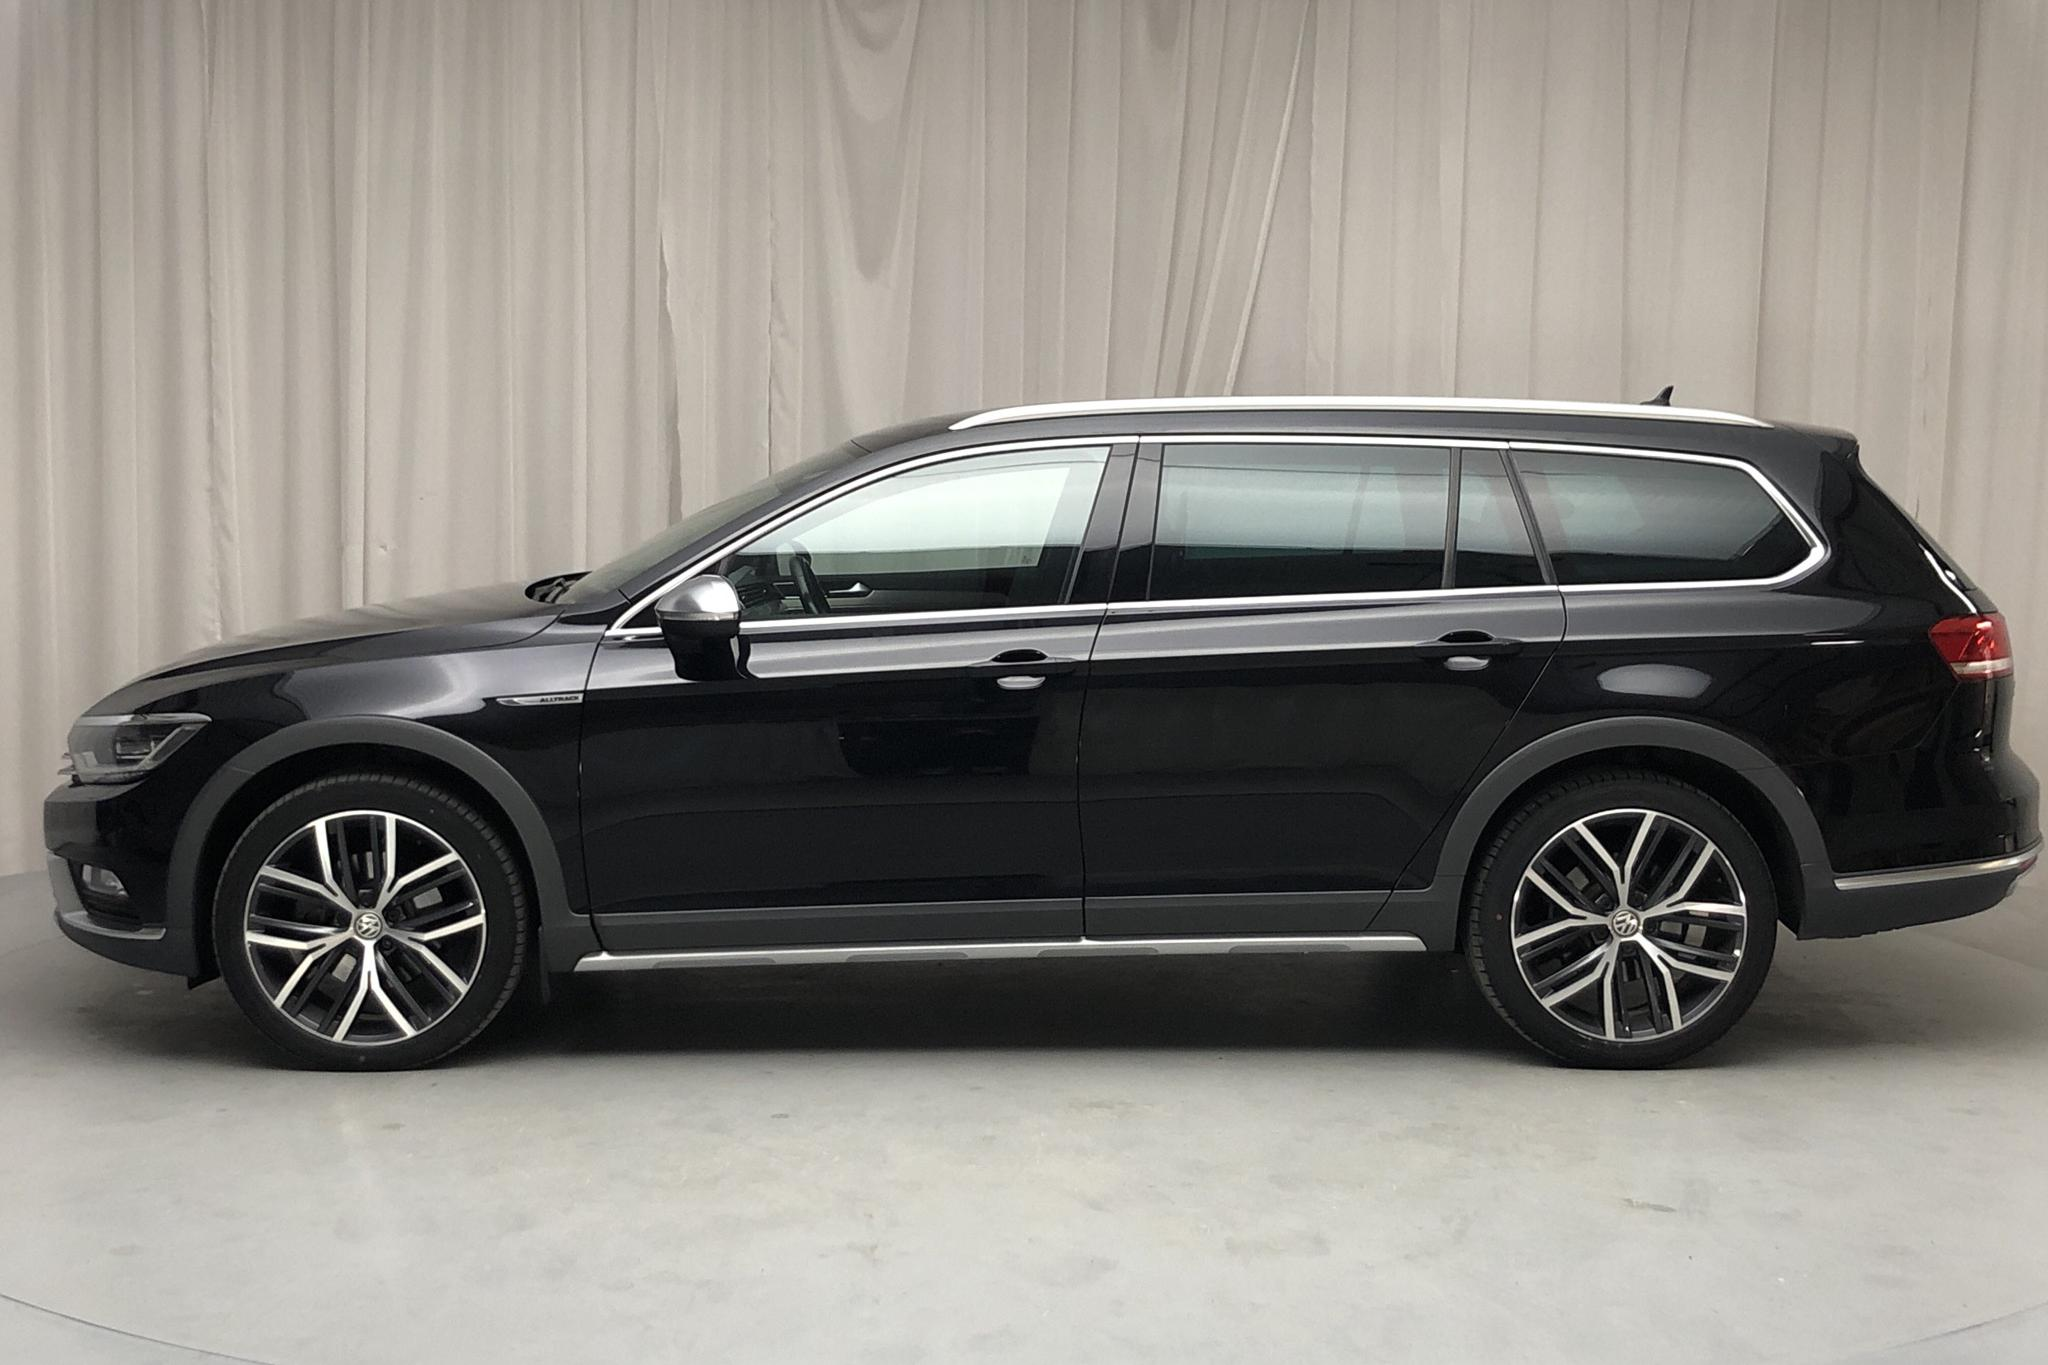 VW Passat Alltrack 2.0 TDI Sportscombi 4MOTION (190hk) - 14 752 mil - Automat - svart - 2018